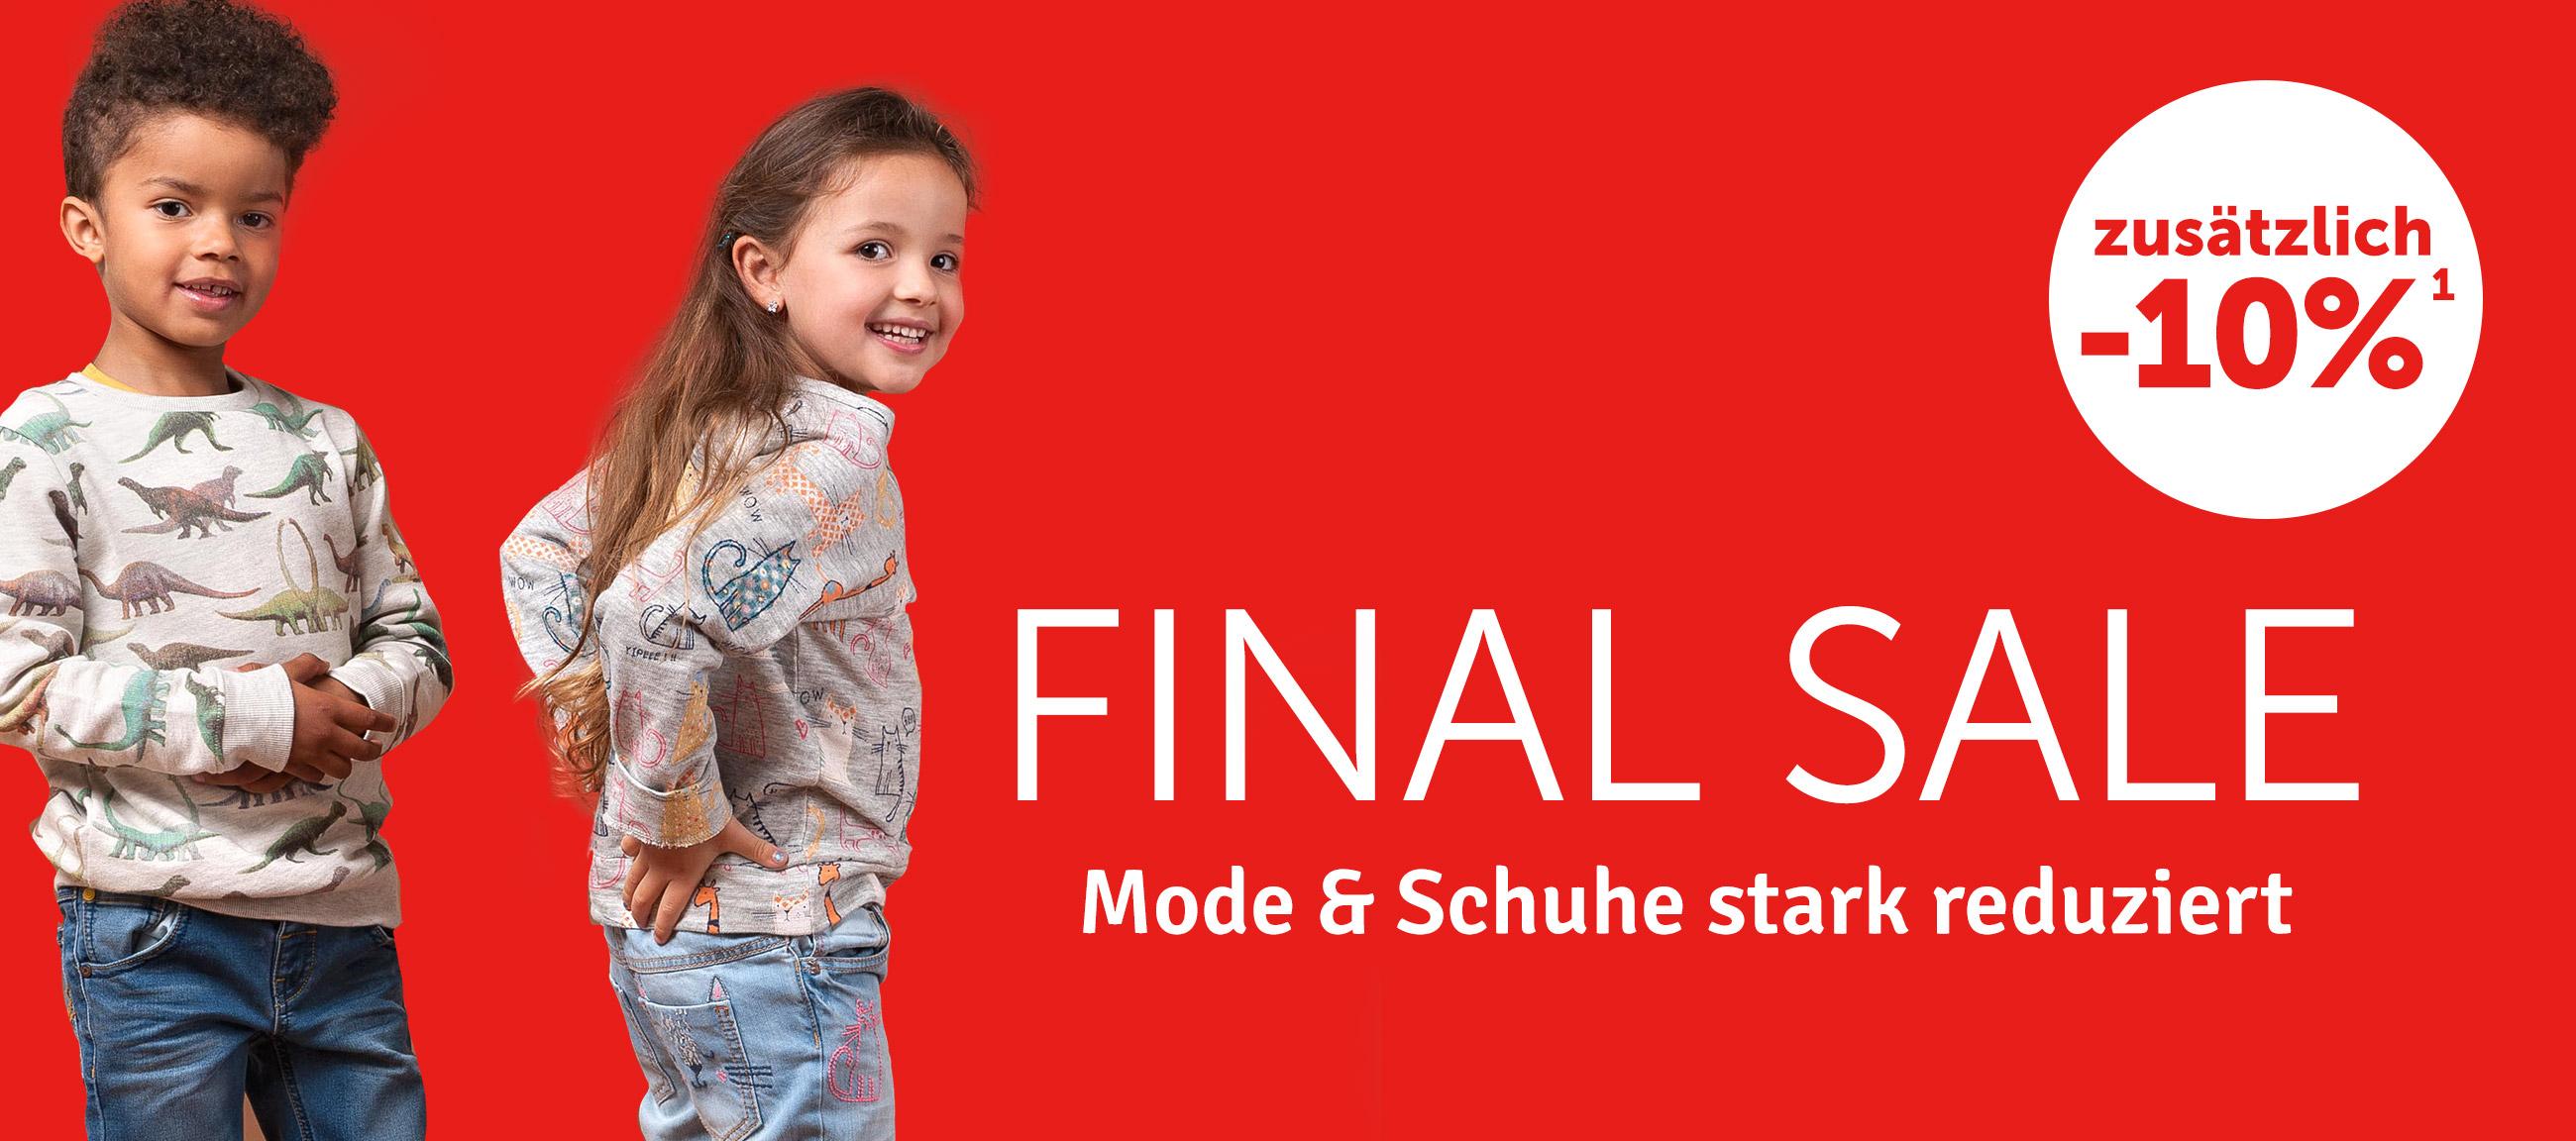 Final Sale bei mytoys.de - 10% on top